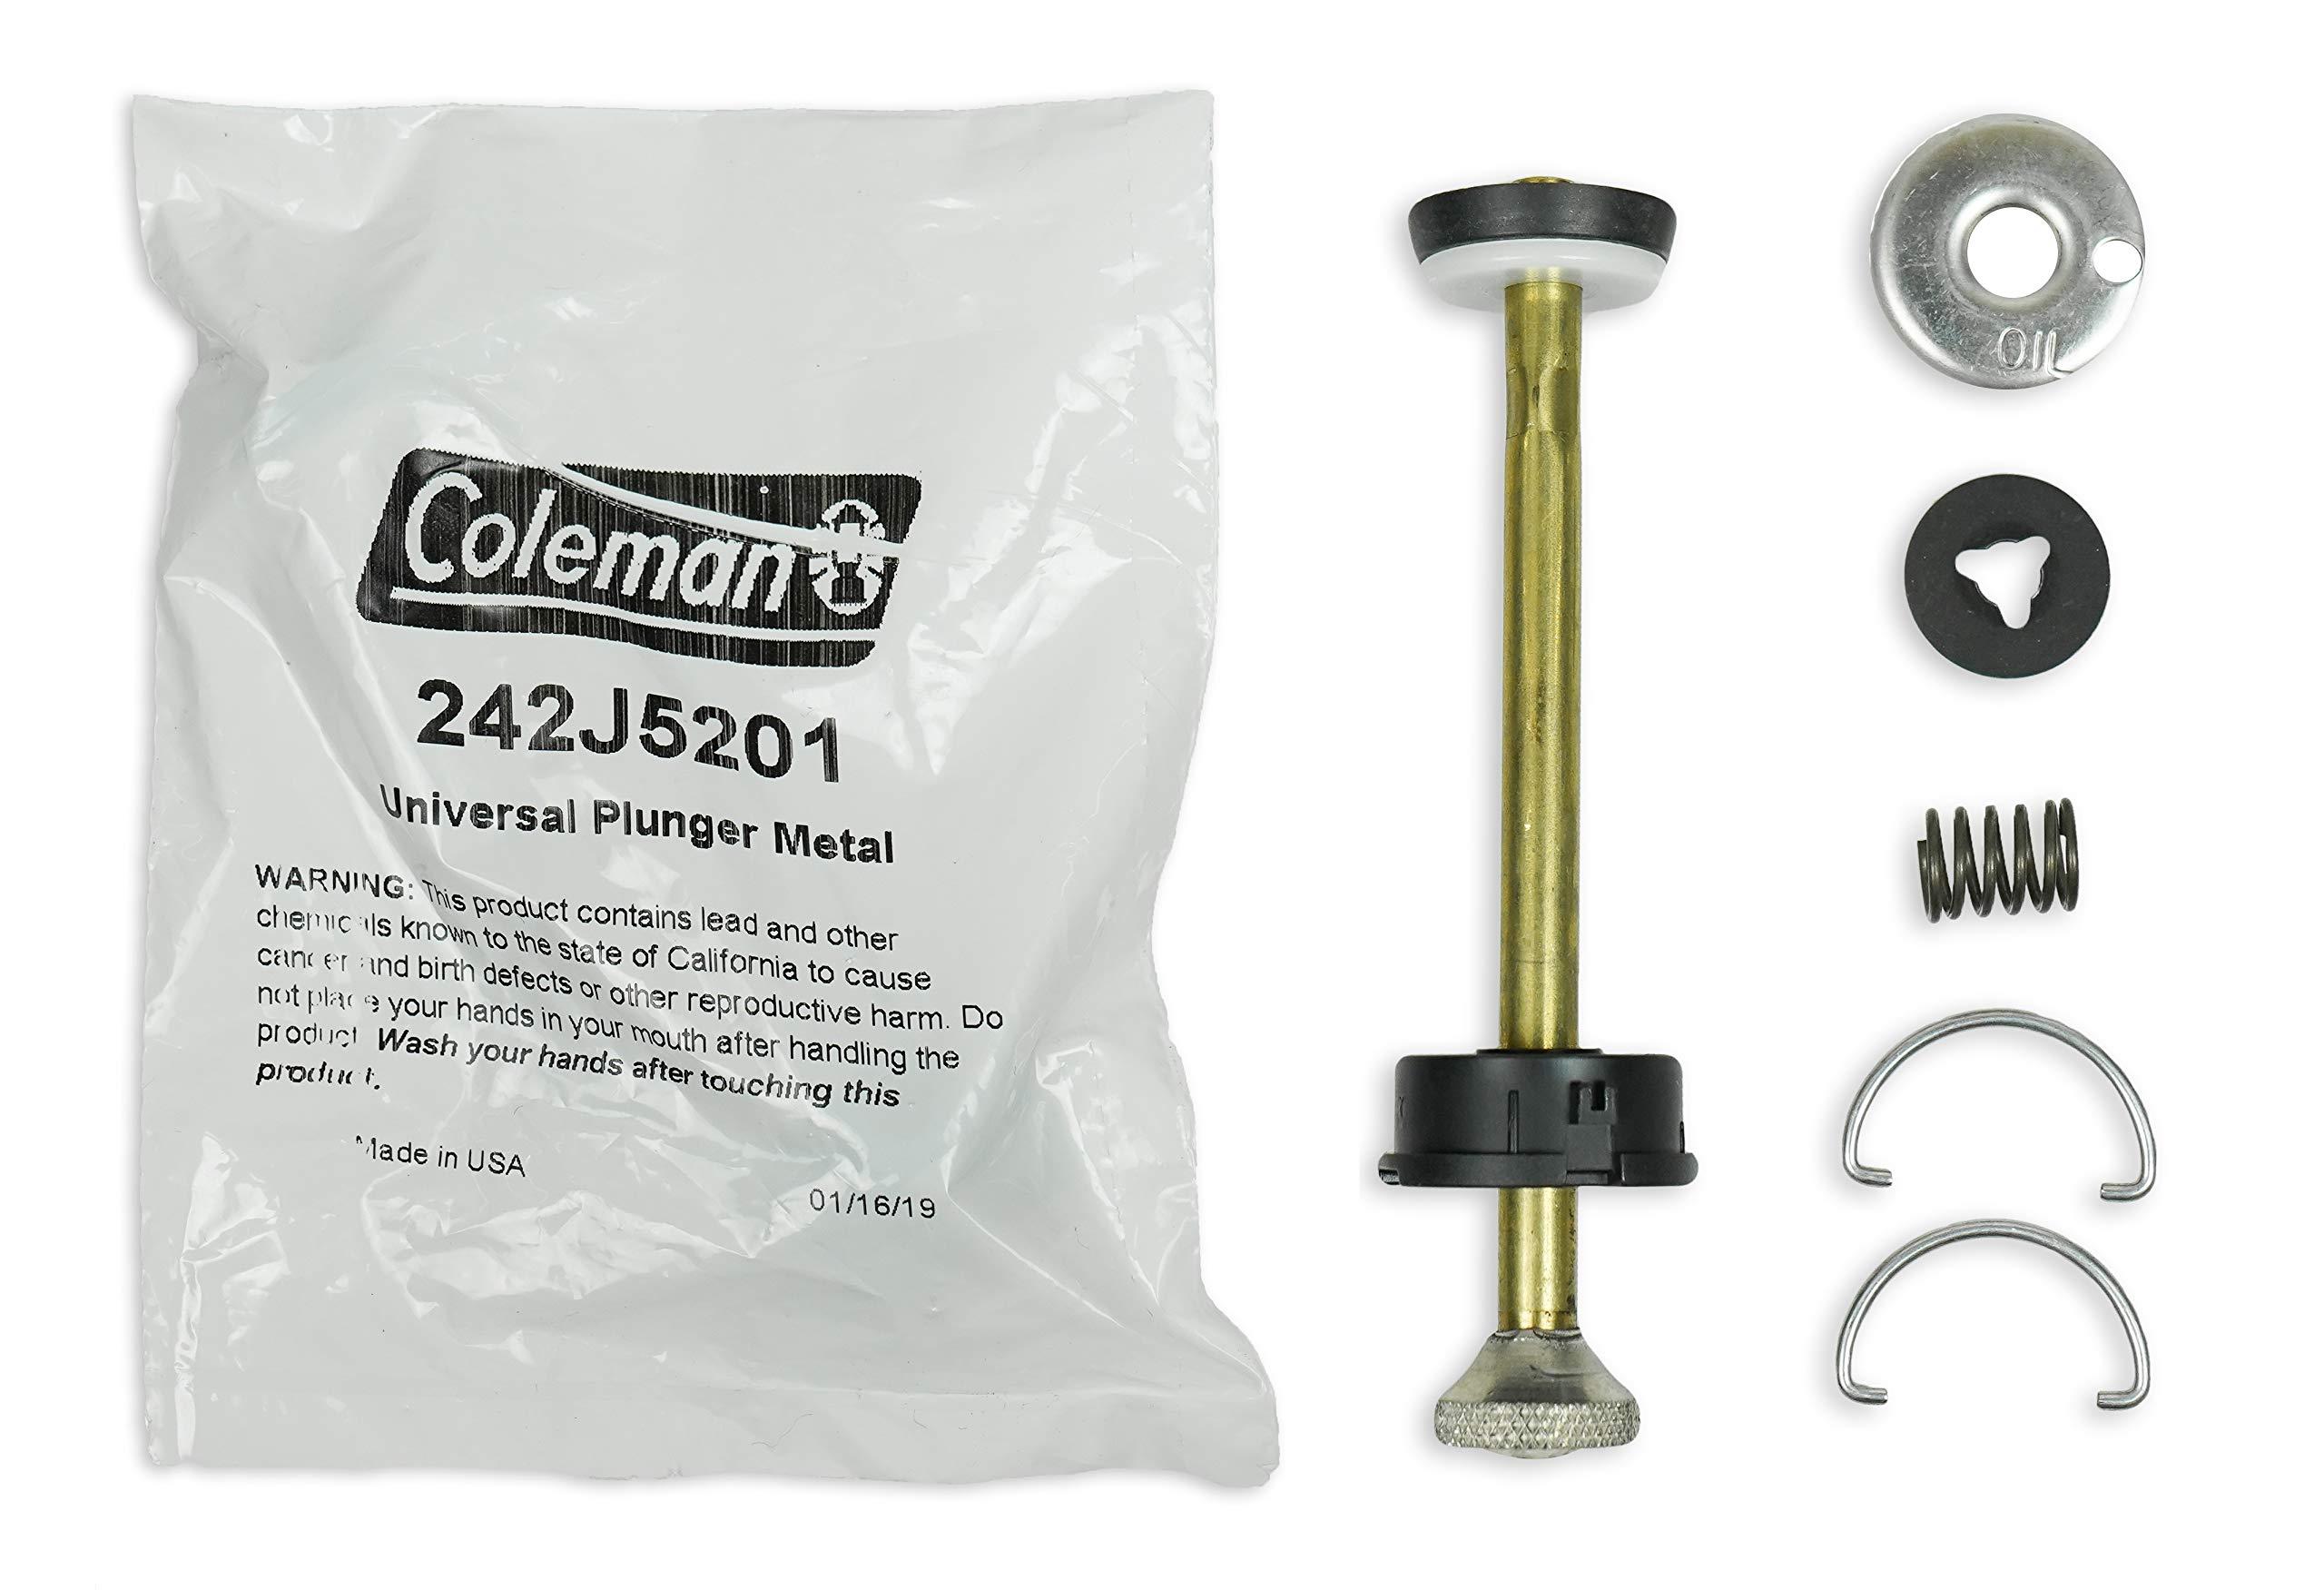 Coleman Universal Plunger Metal Part #: 242J5201 ; 4 Inch Long Plunger Pump Repair Kit ; Compatible Stoves & Lanterns by Coleman